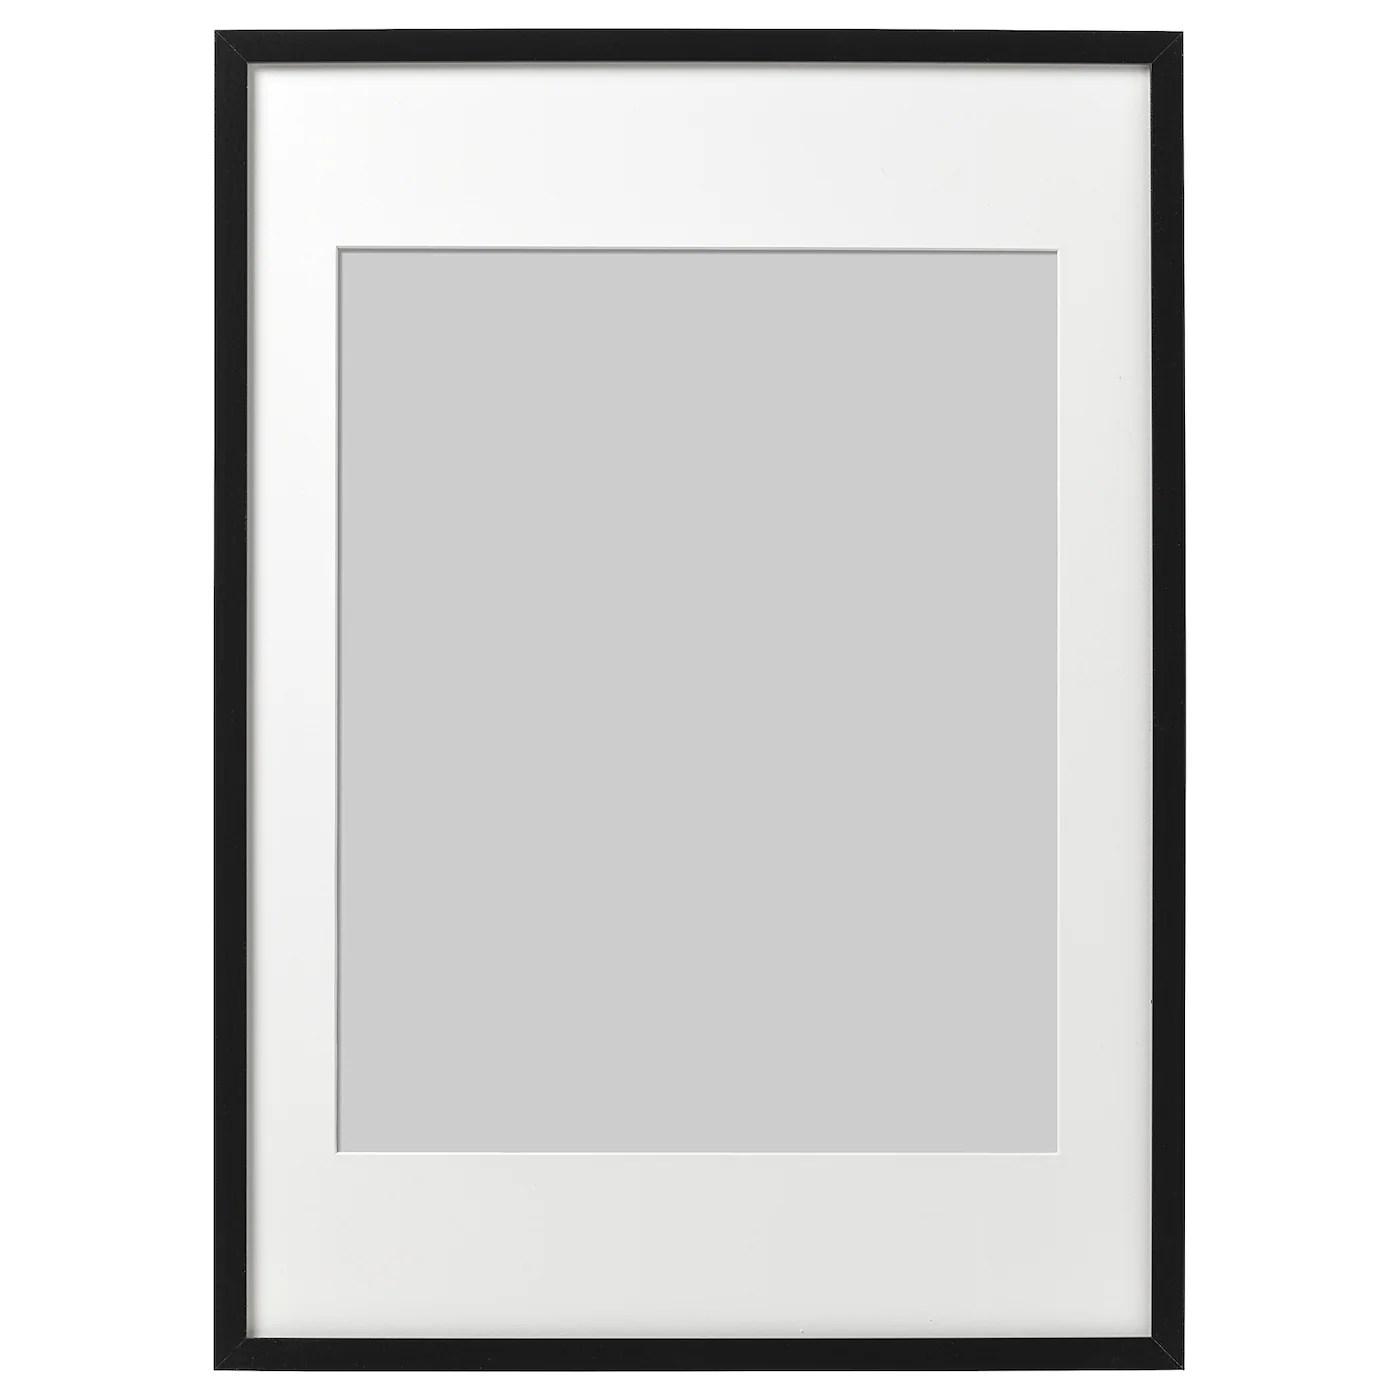 ribba frame black 19 x27 50x70 cm